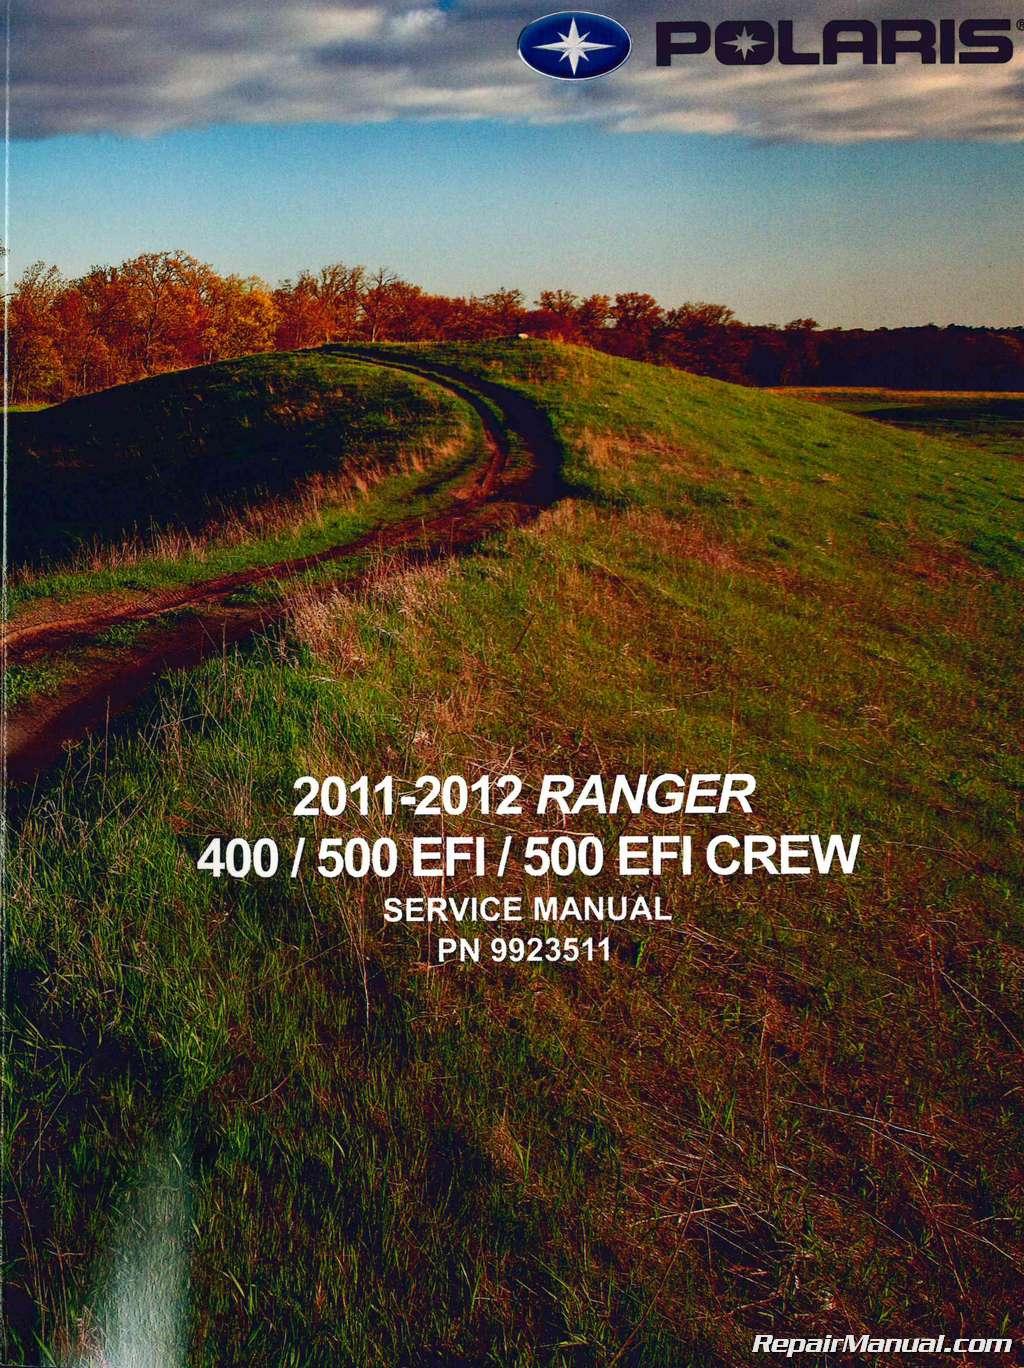 hight resolution of 2011 2012 polaris ranger 400